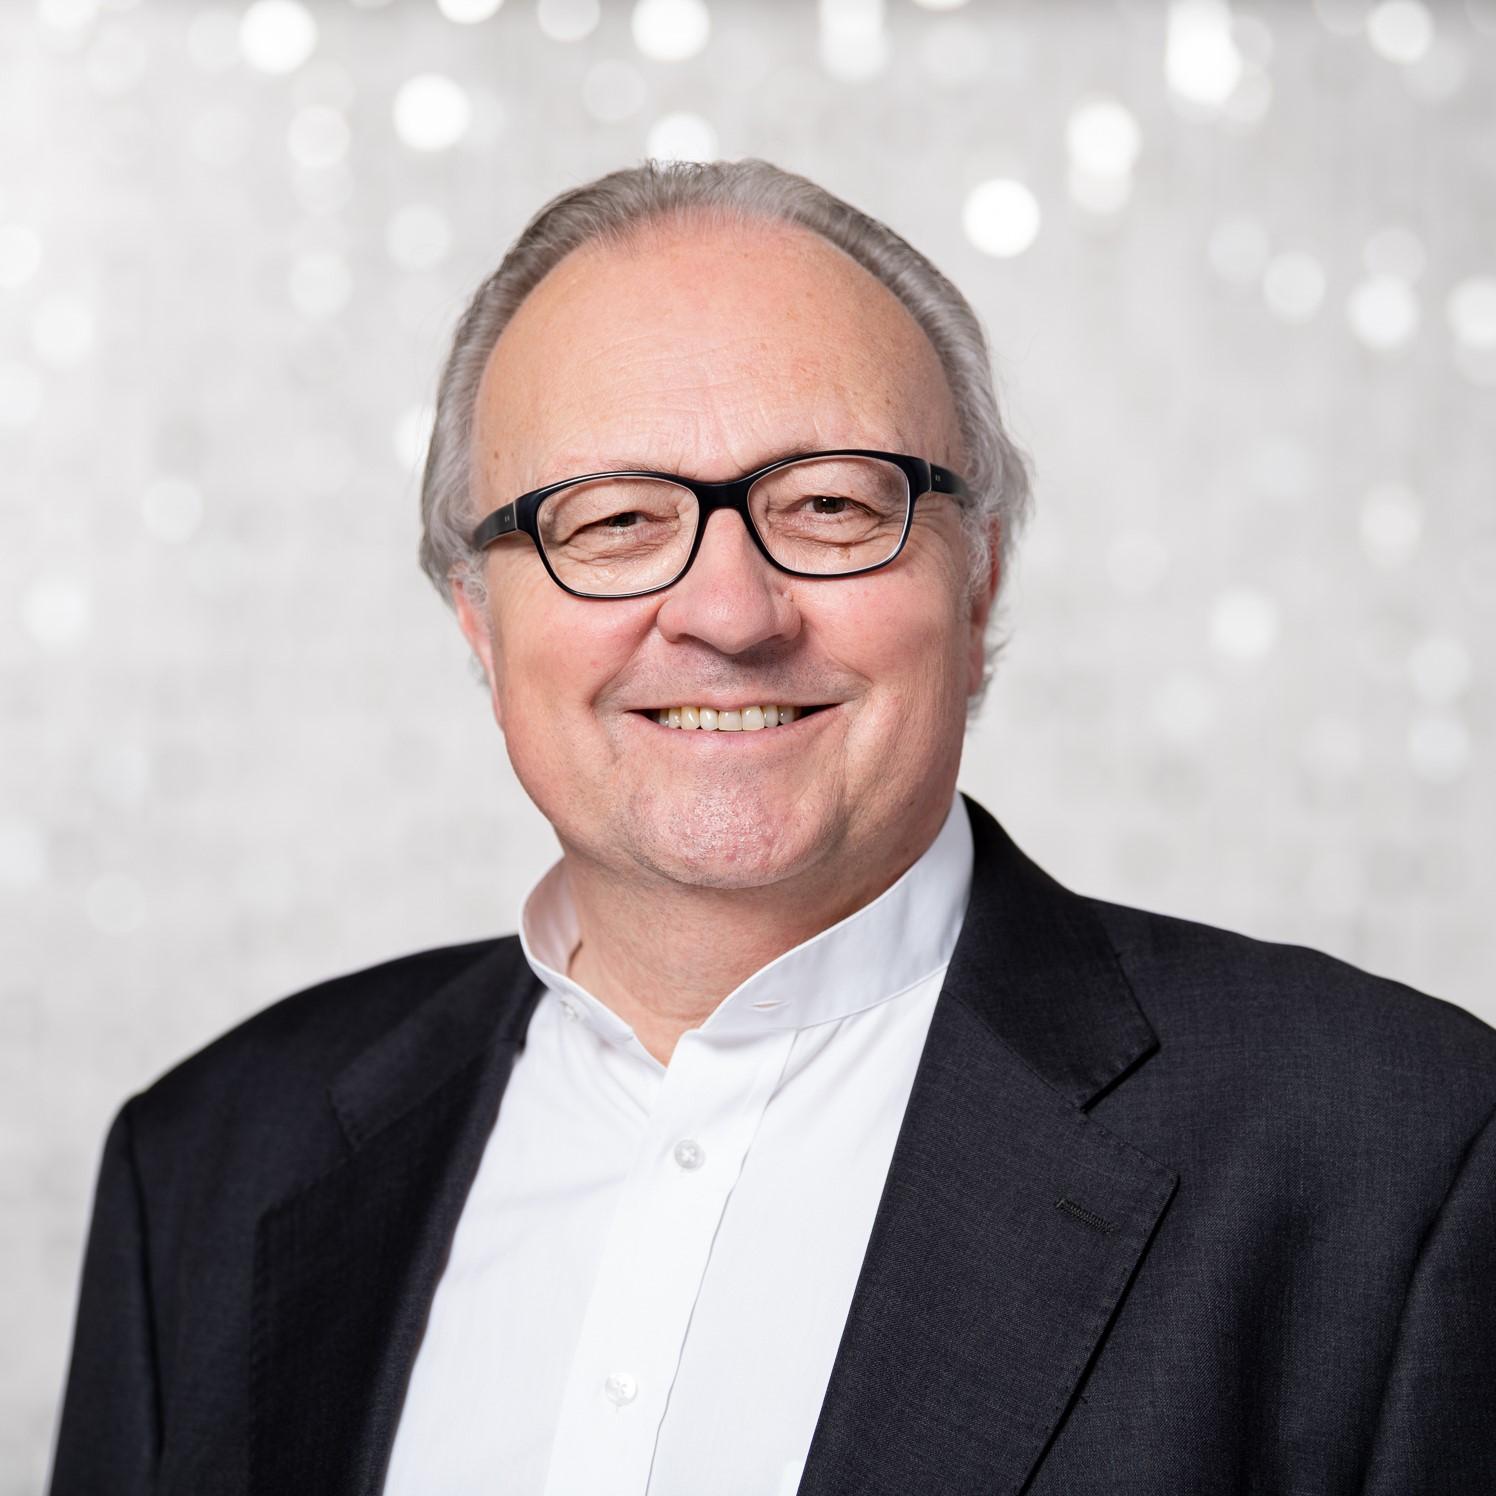 Prof. em. Dr. iur. Marcel Senn